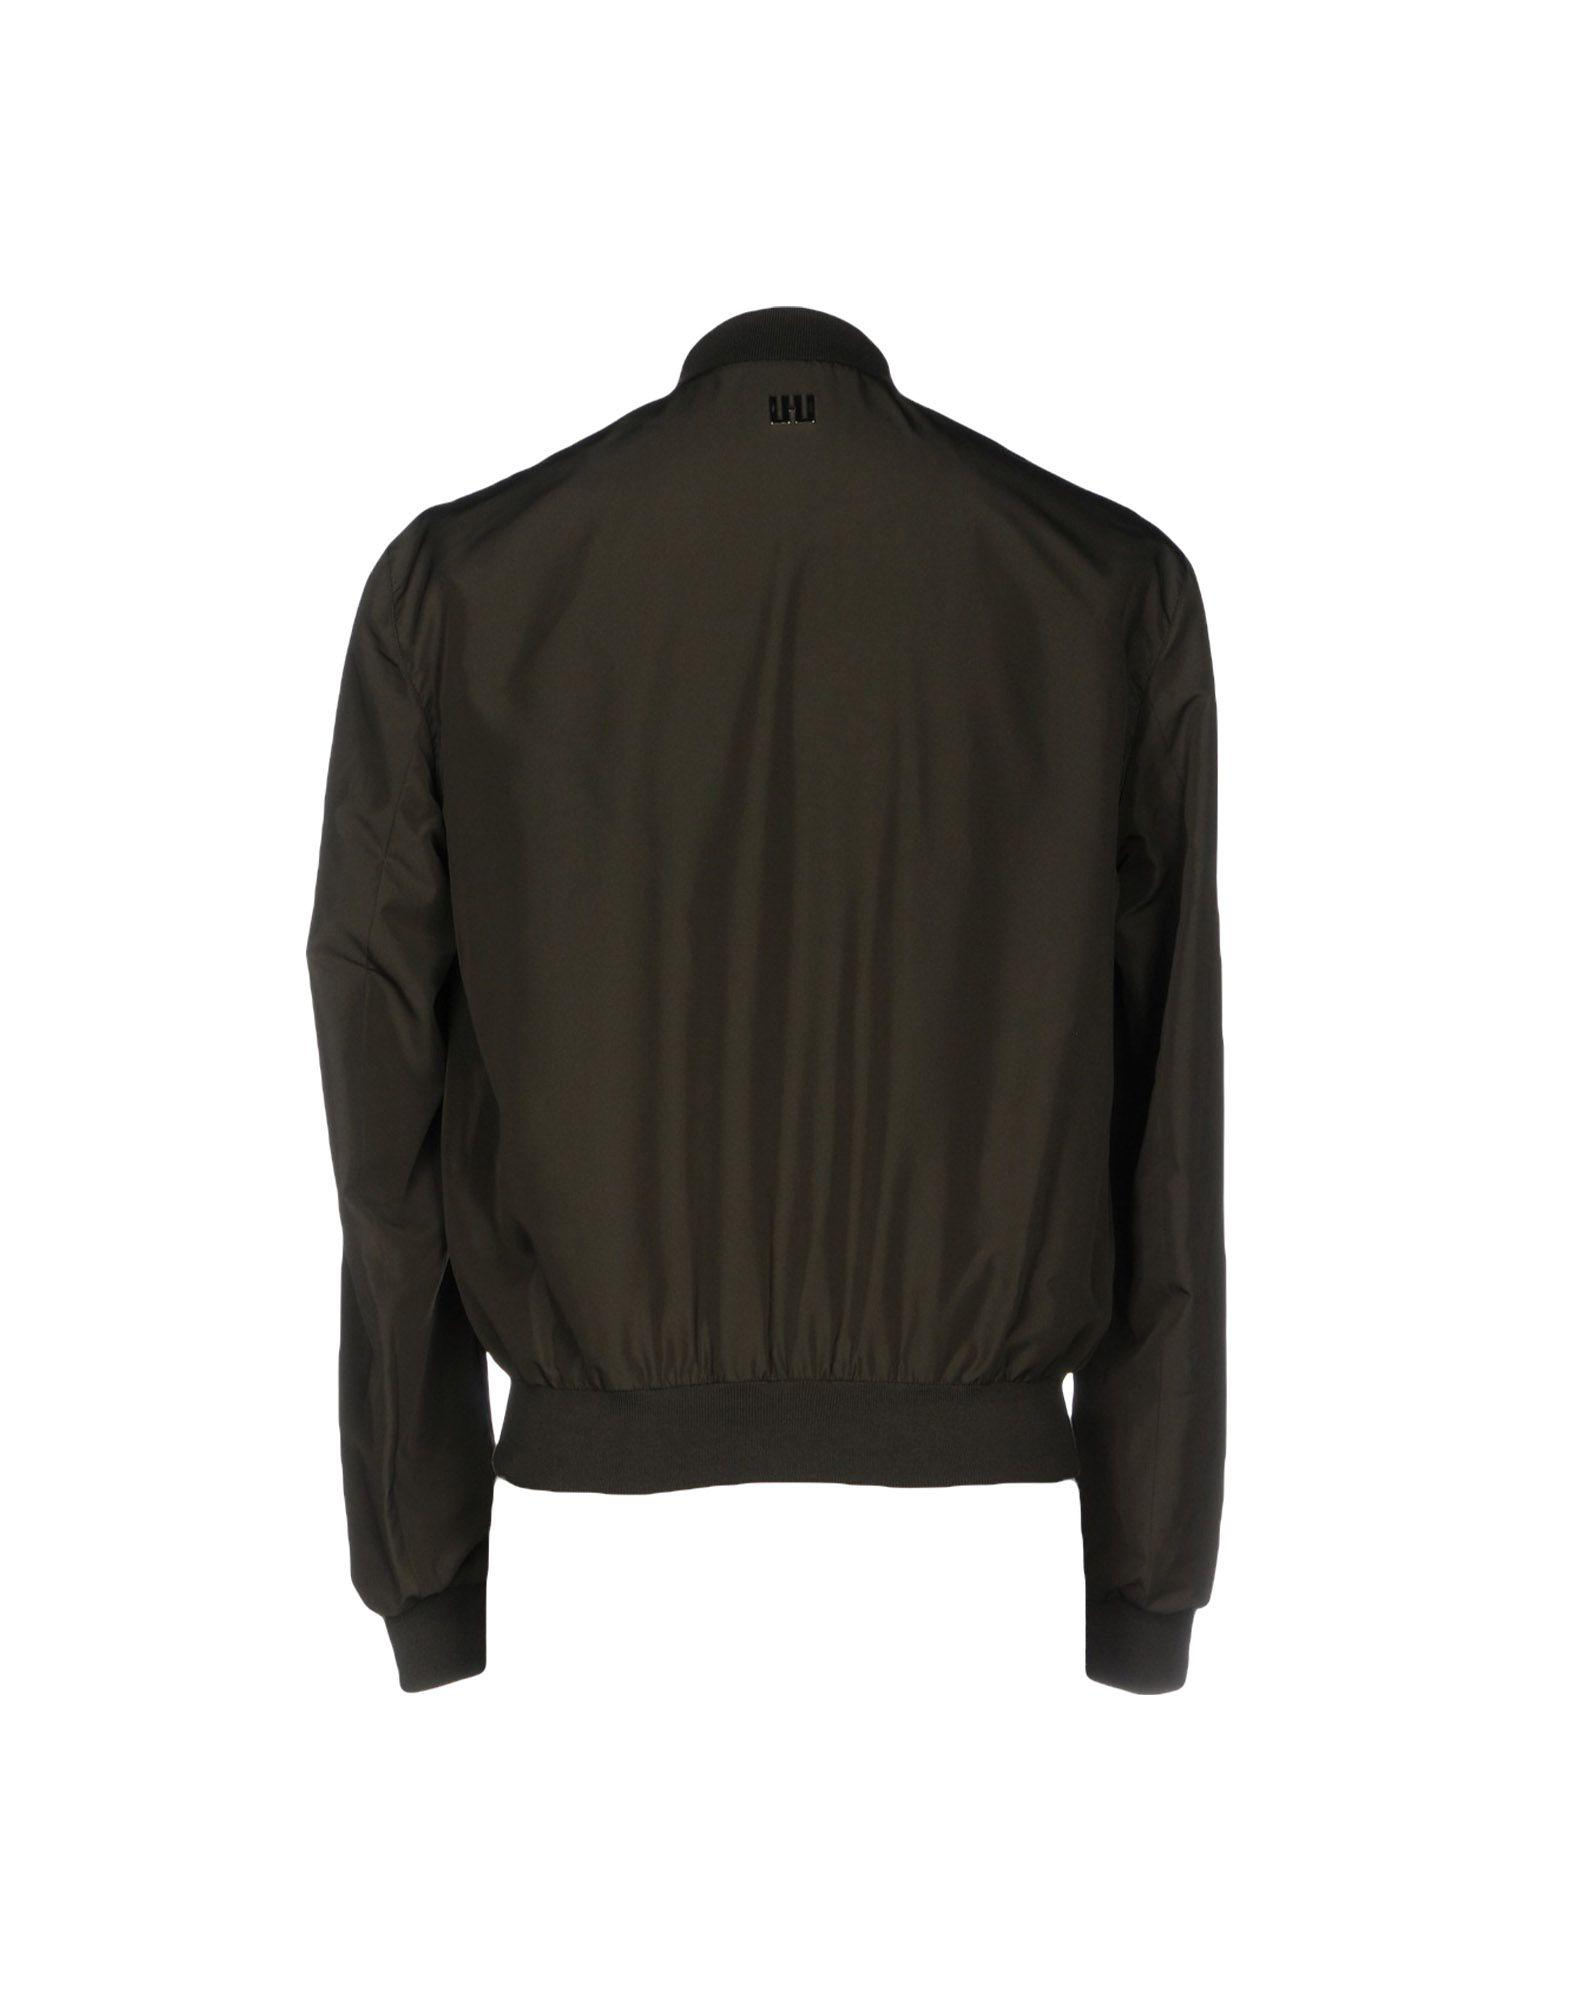 LHU URBAN Synthetic Jacket in Dark Green (Green) for Men